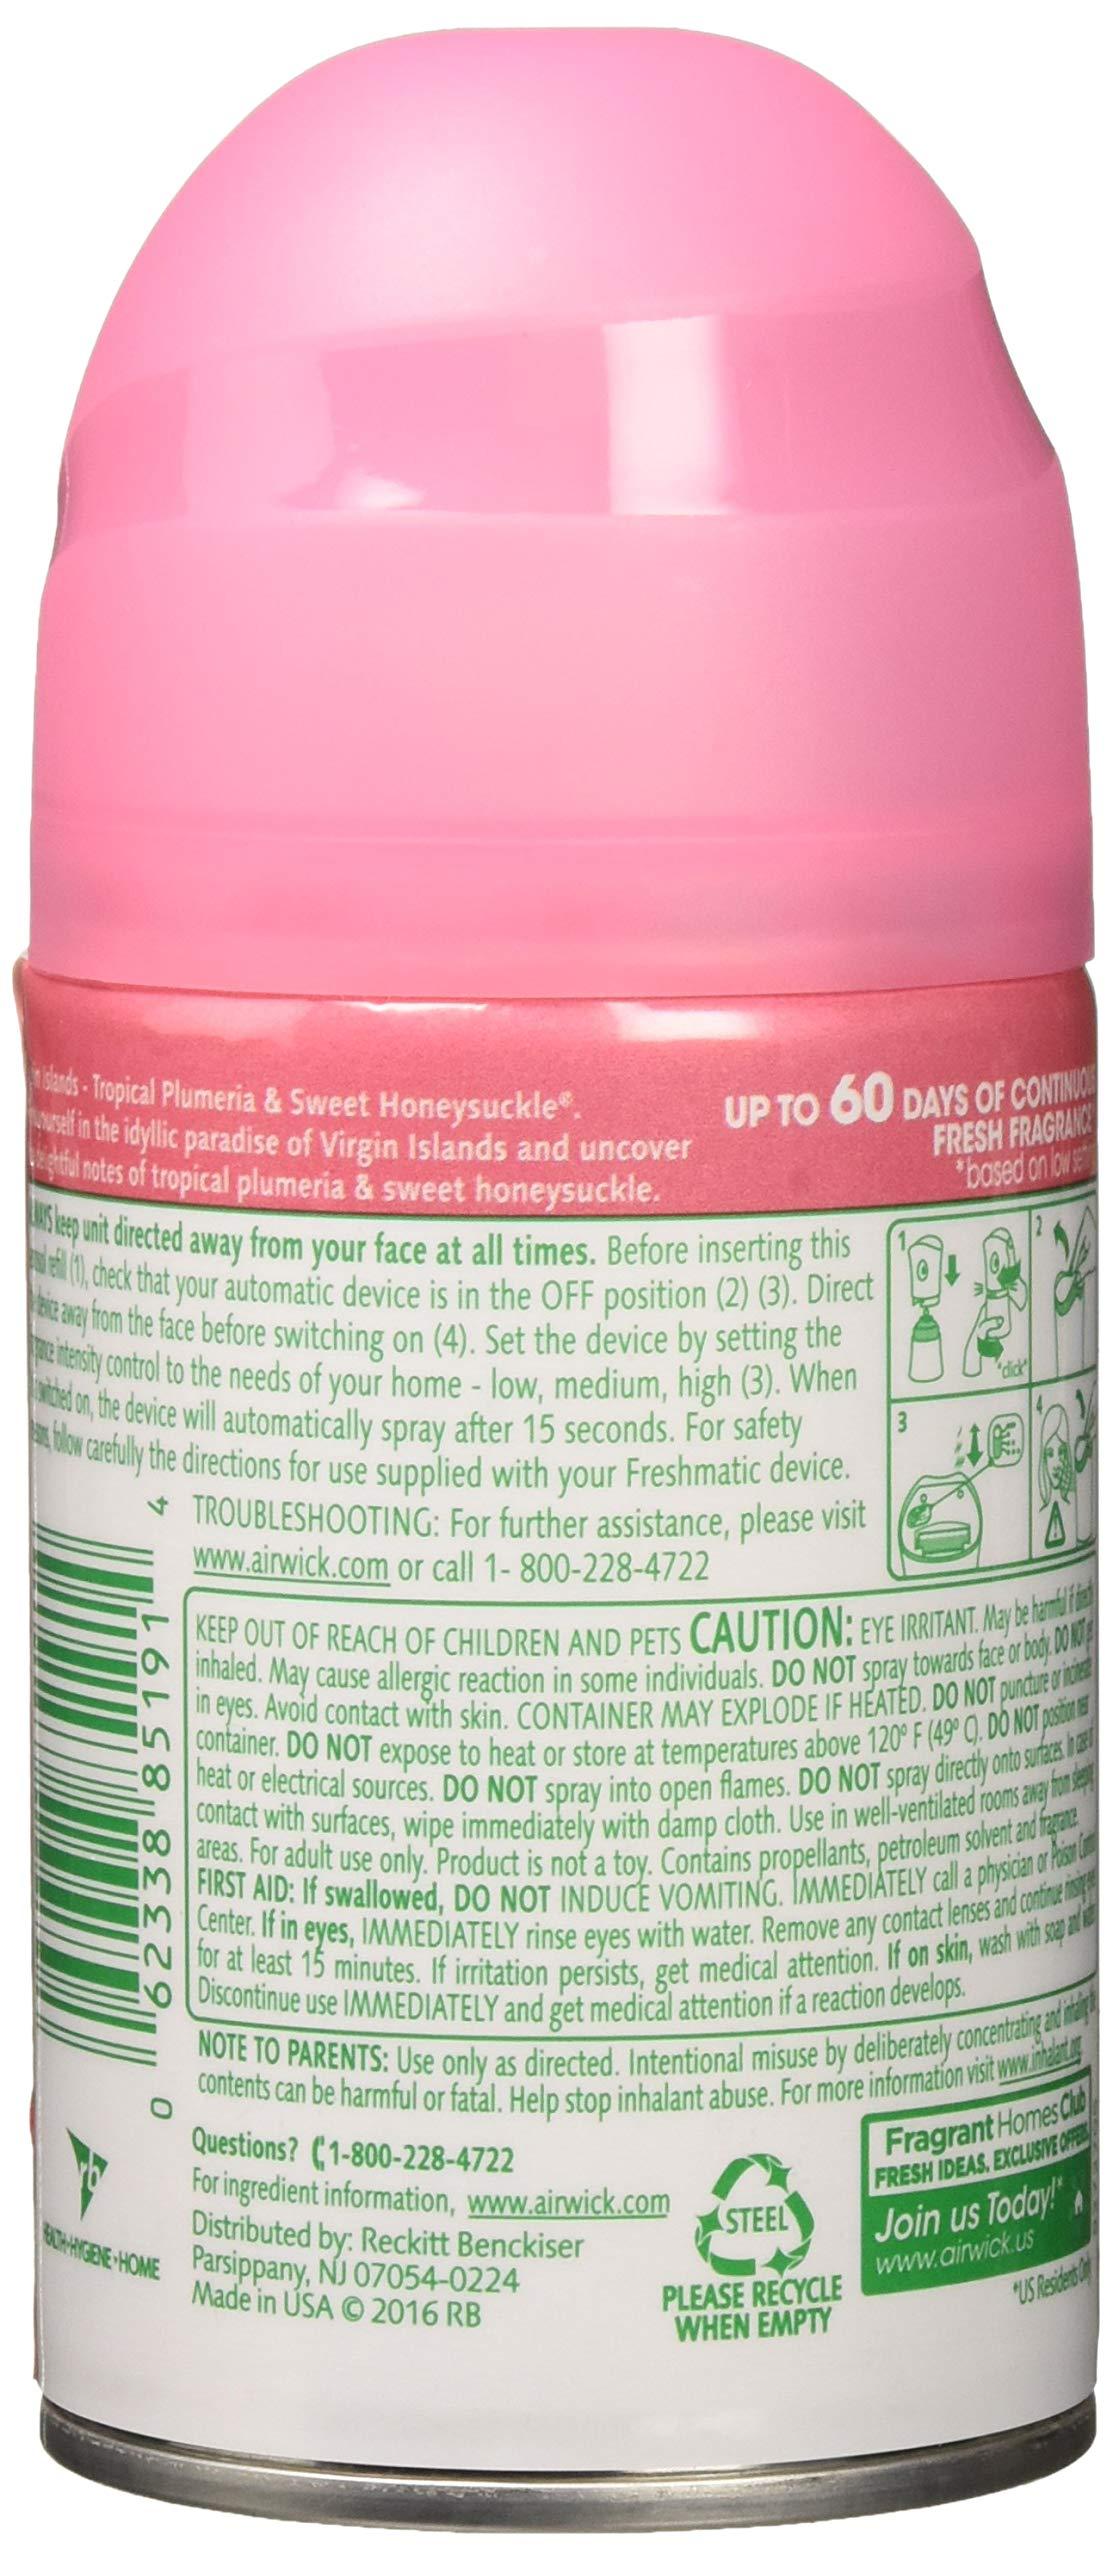 Air Wick Freshmatic 6 Refills Automatic Spray, Virgin Islands, (6X6.17oz), Air Freshener by Air Wick (Image #2)